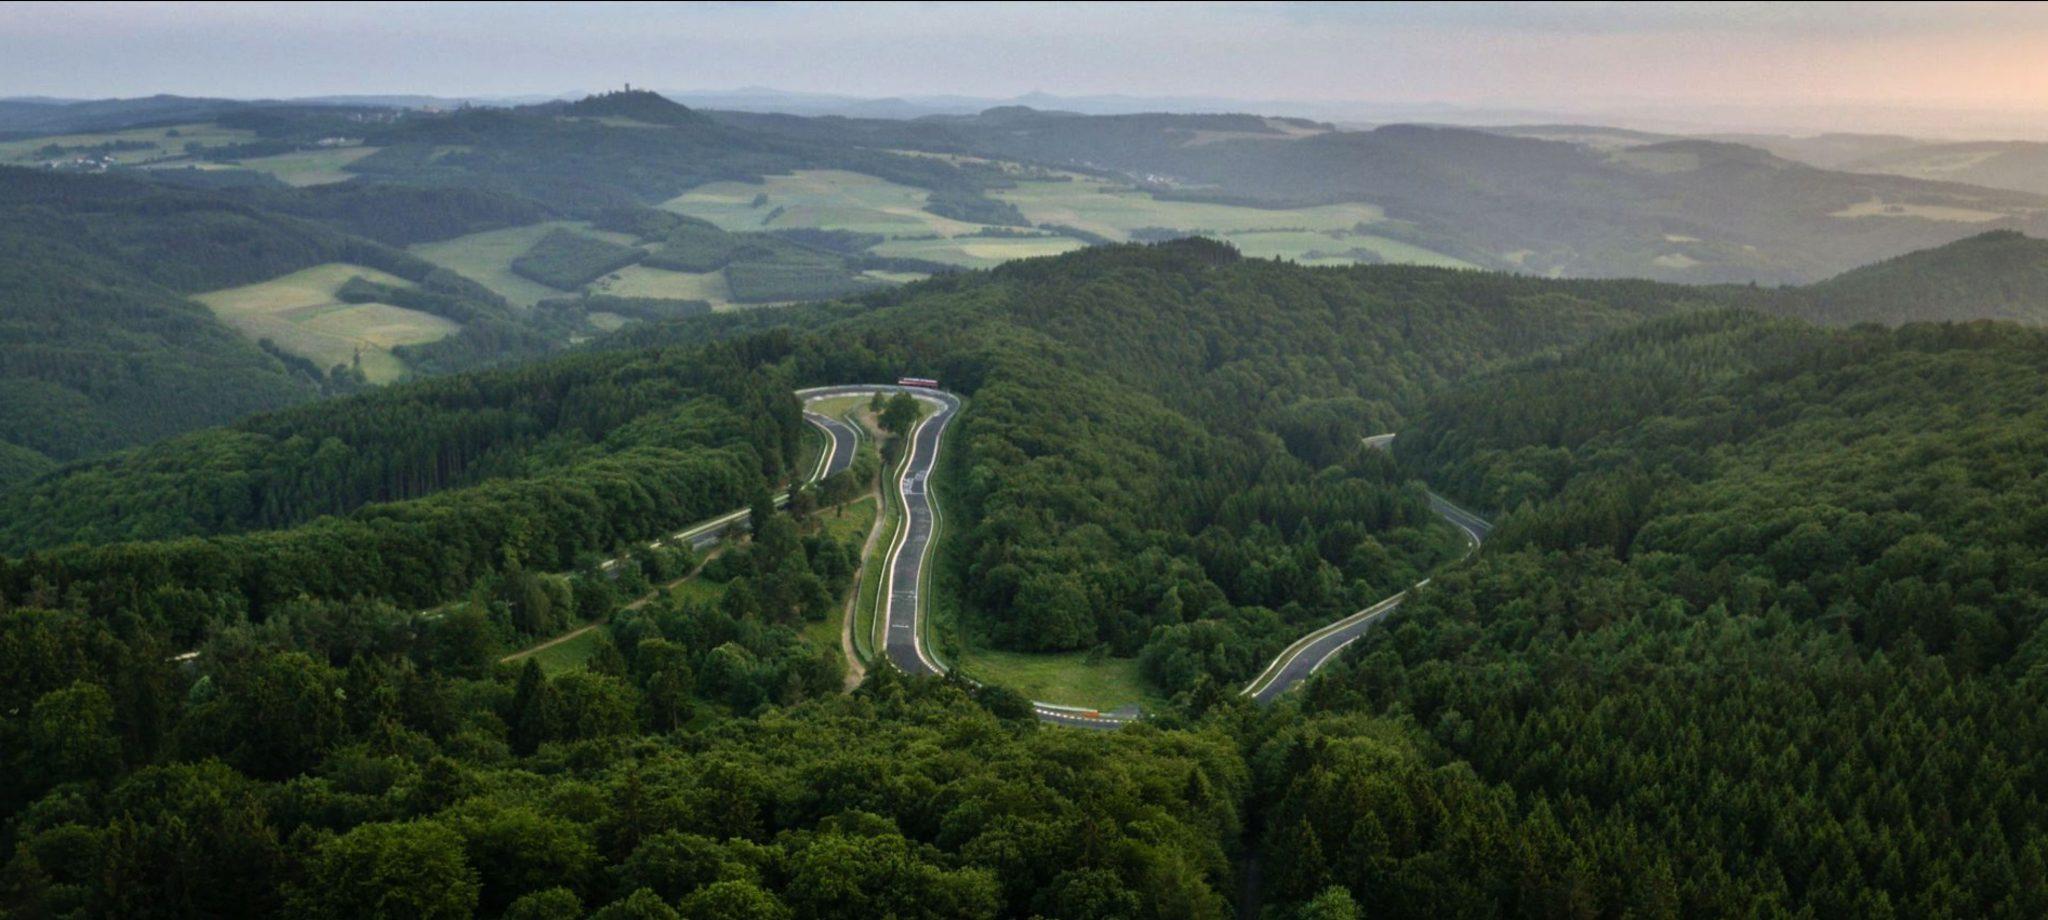 professionelle luftaufnahmen Drohne Nürburgring